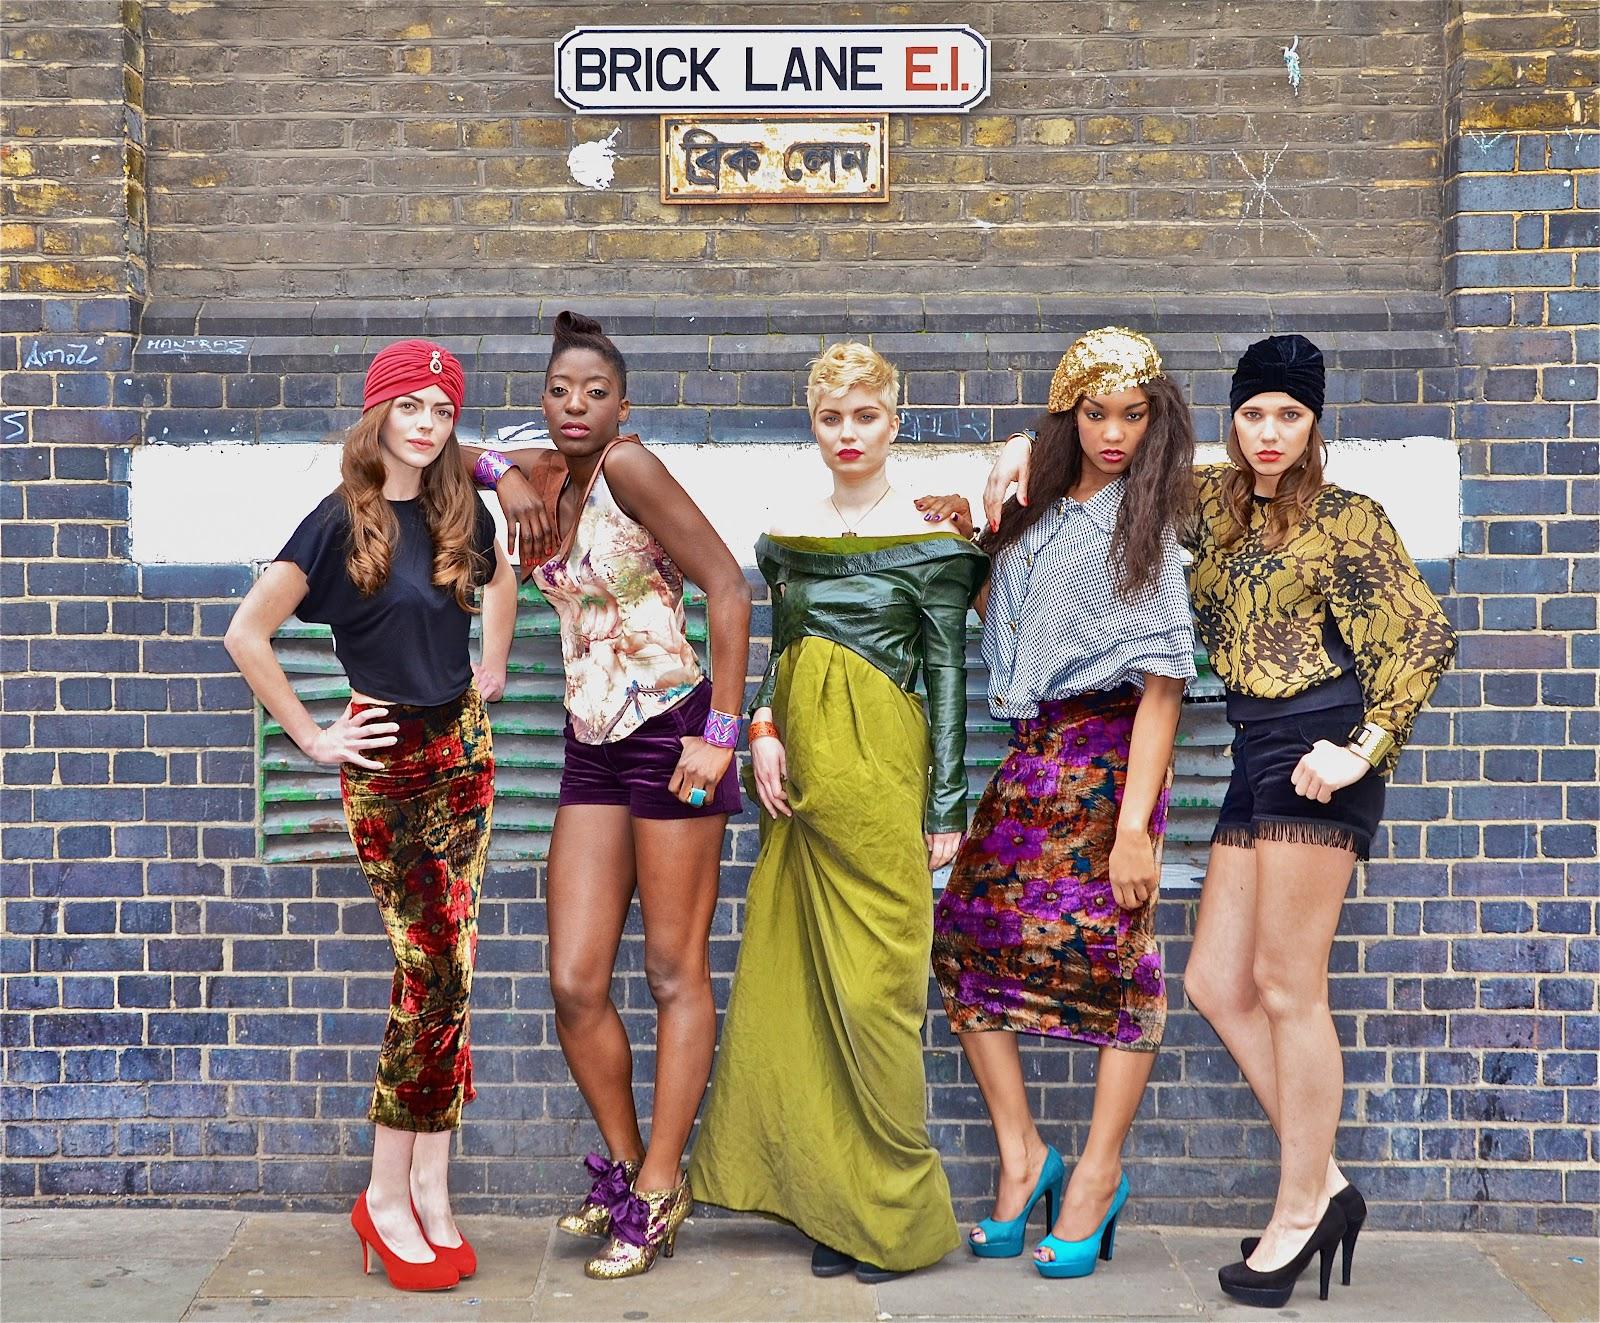 Fashion Show La Brick Lane Style Of A London Tall Girl